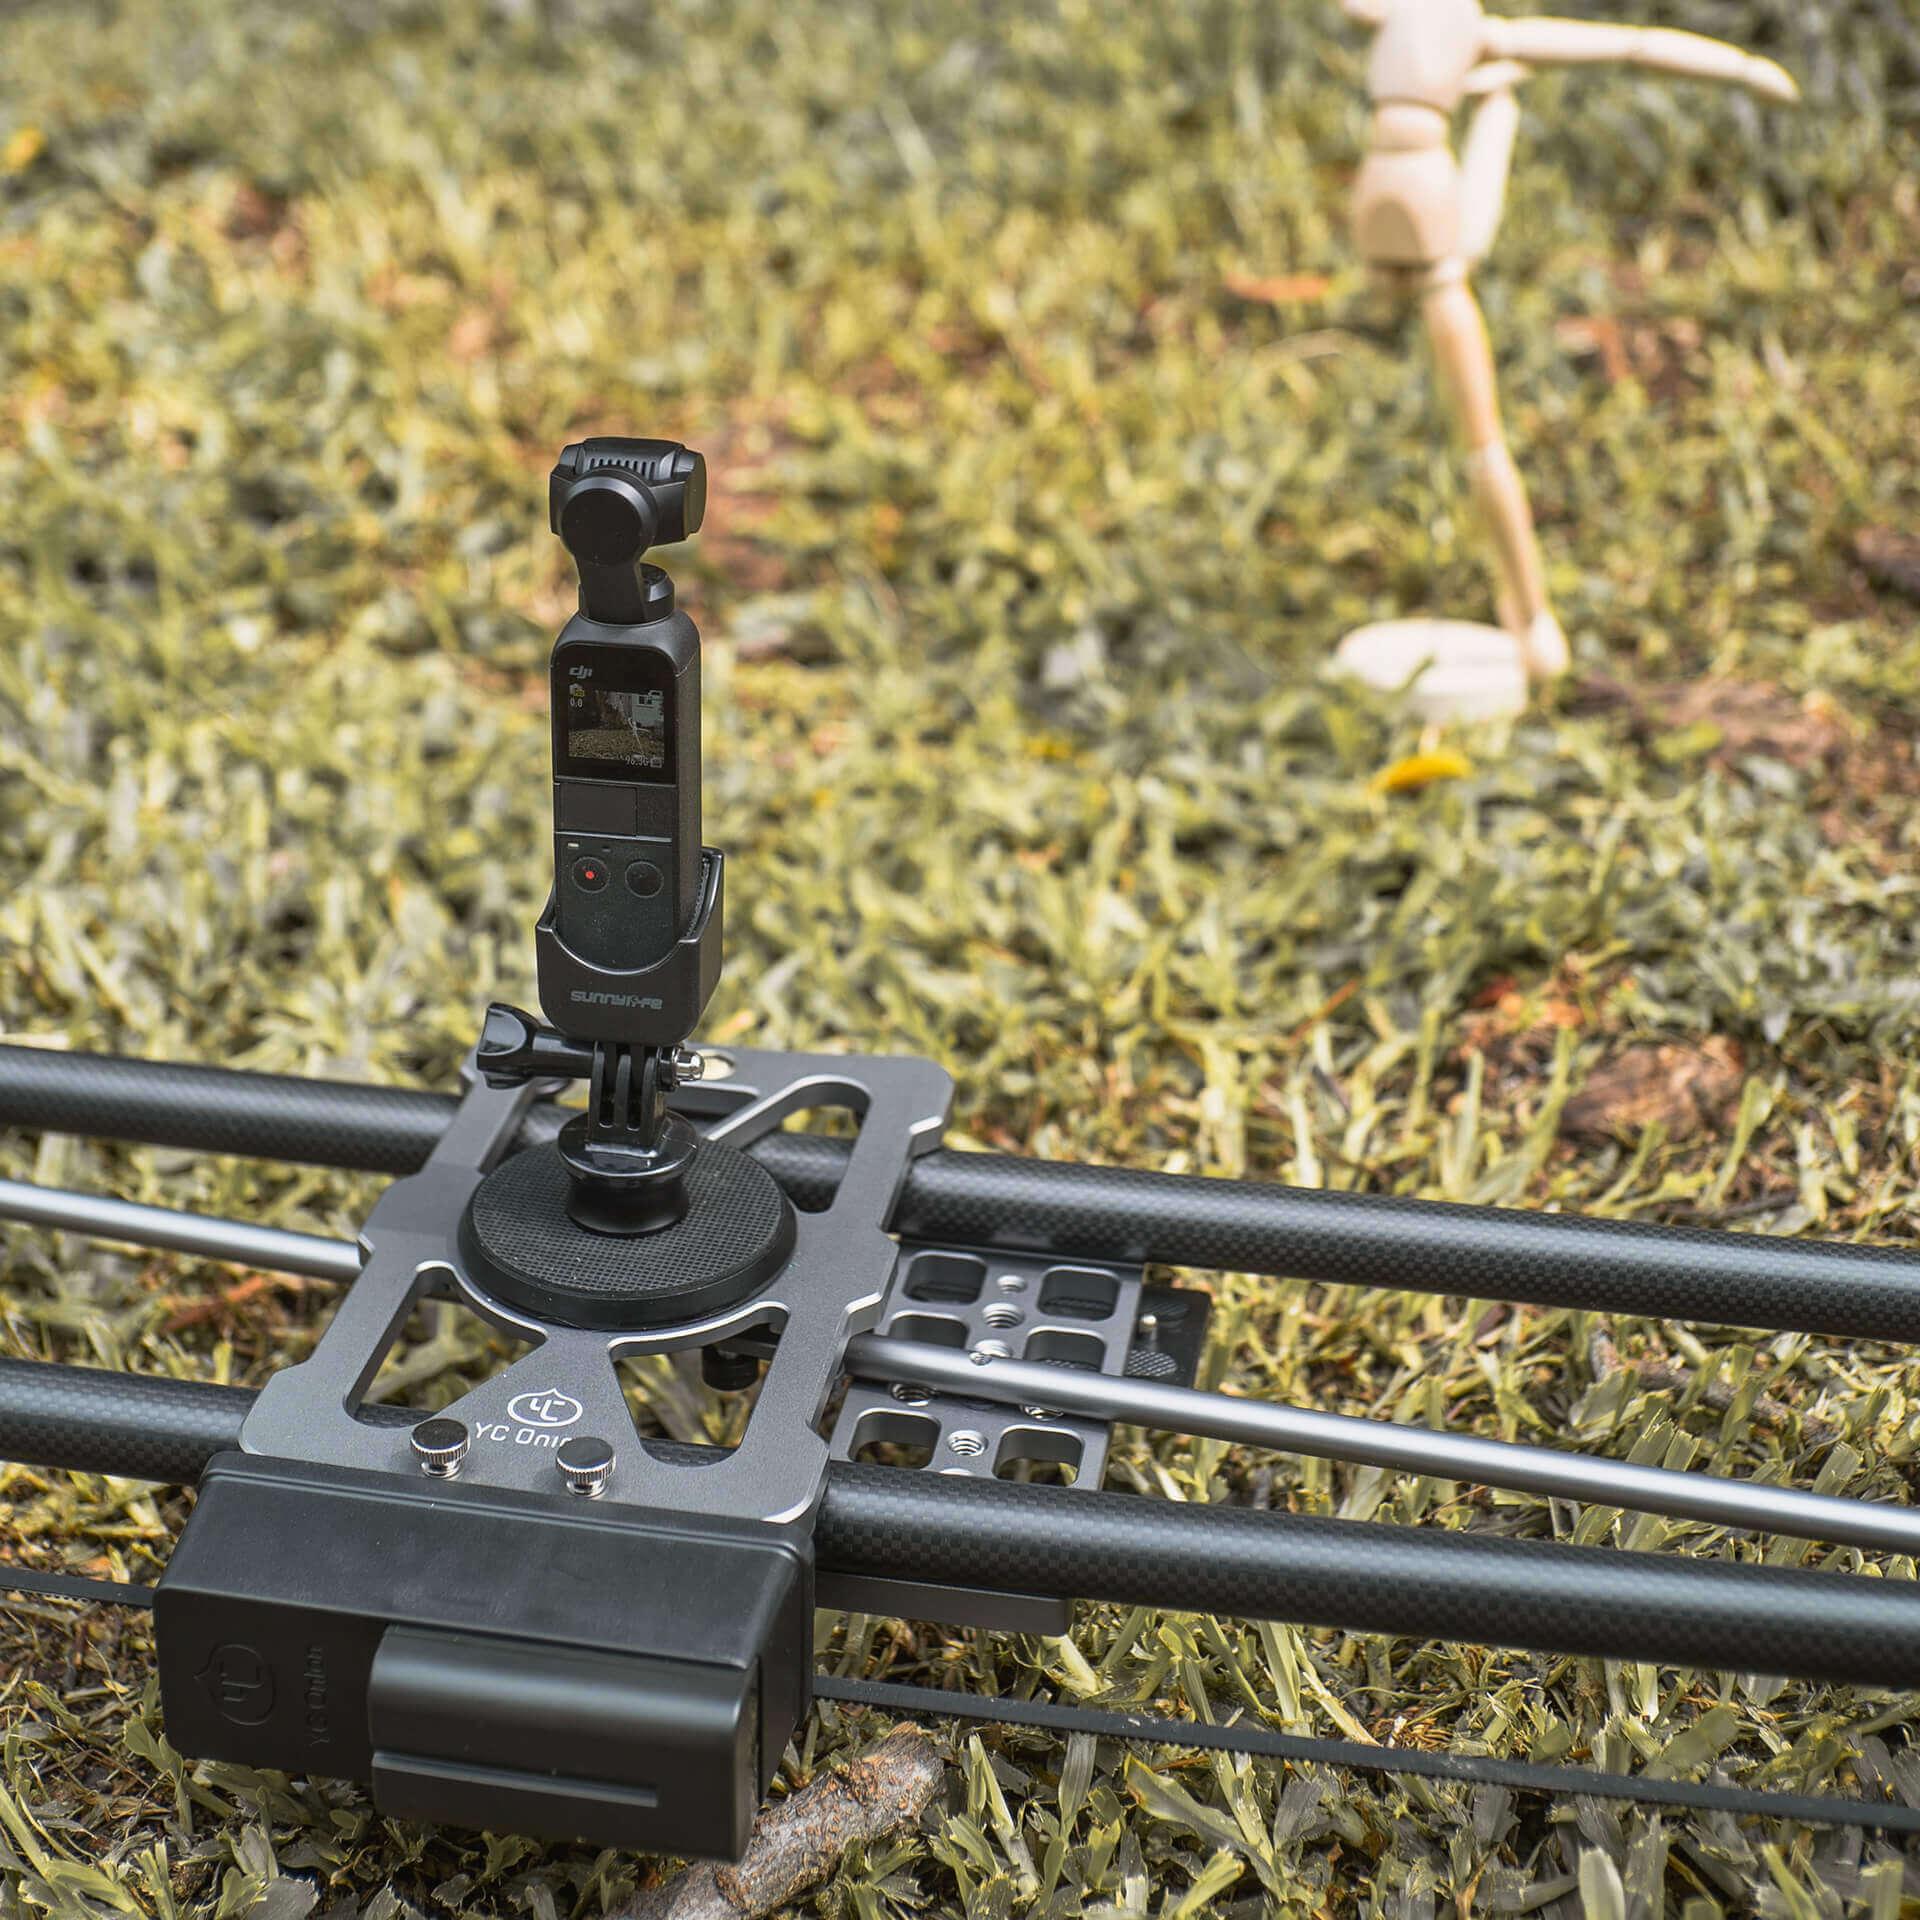 YC Onion HDM120 HOT DOG 120cm prlx Pan Slider with App 6